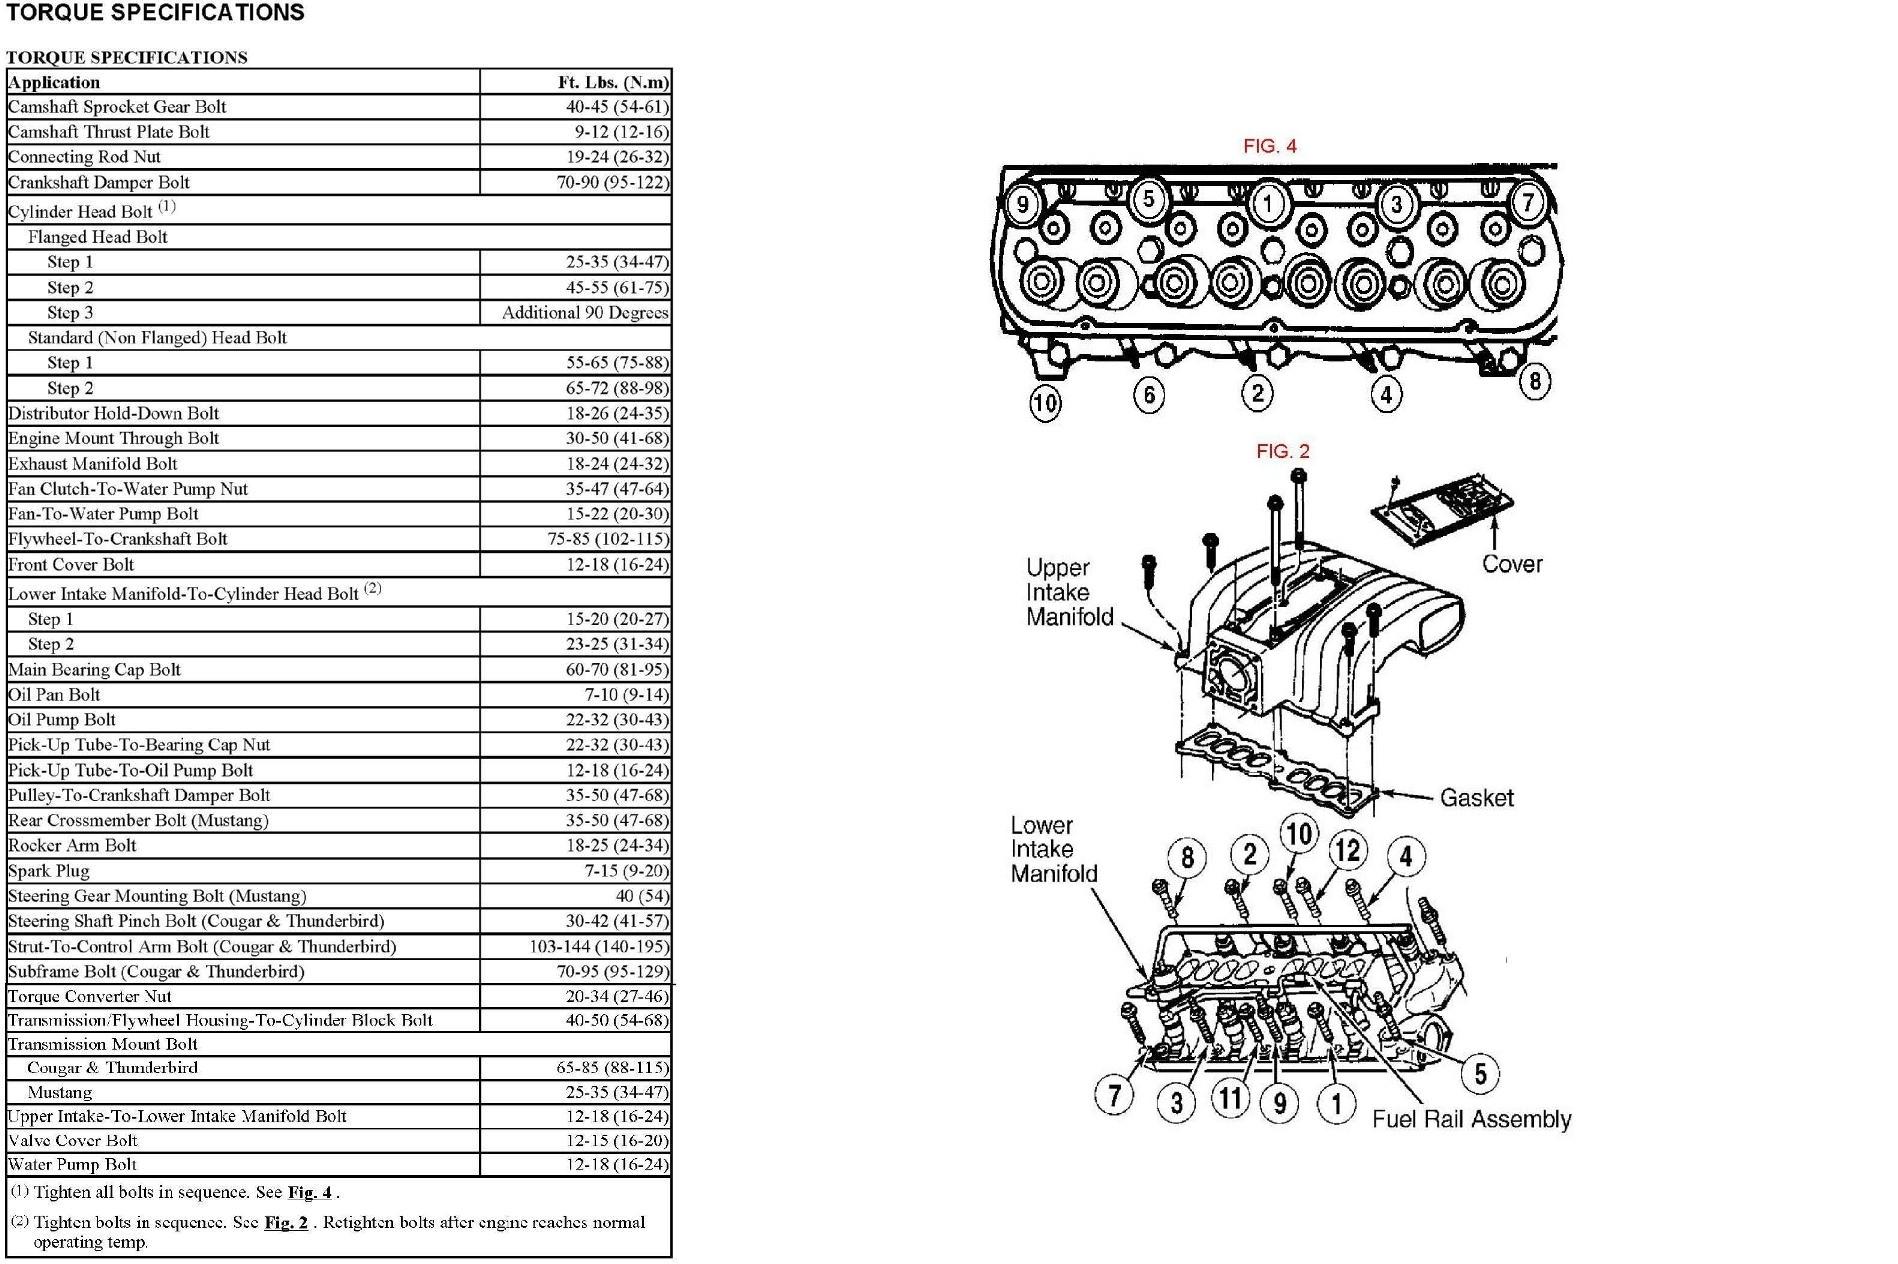 Straight 6 Engine Diagram Fox Body 302 Engine Diagram Wiring Info • Of Straight 6 Engine Diagram